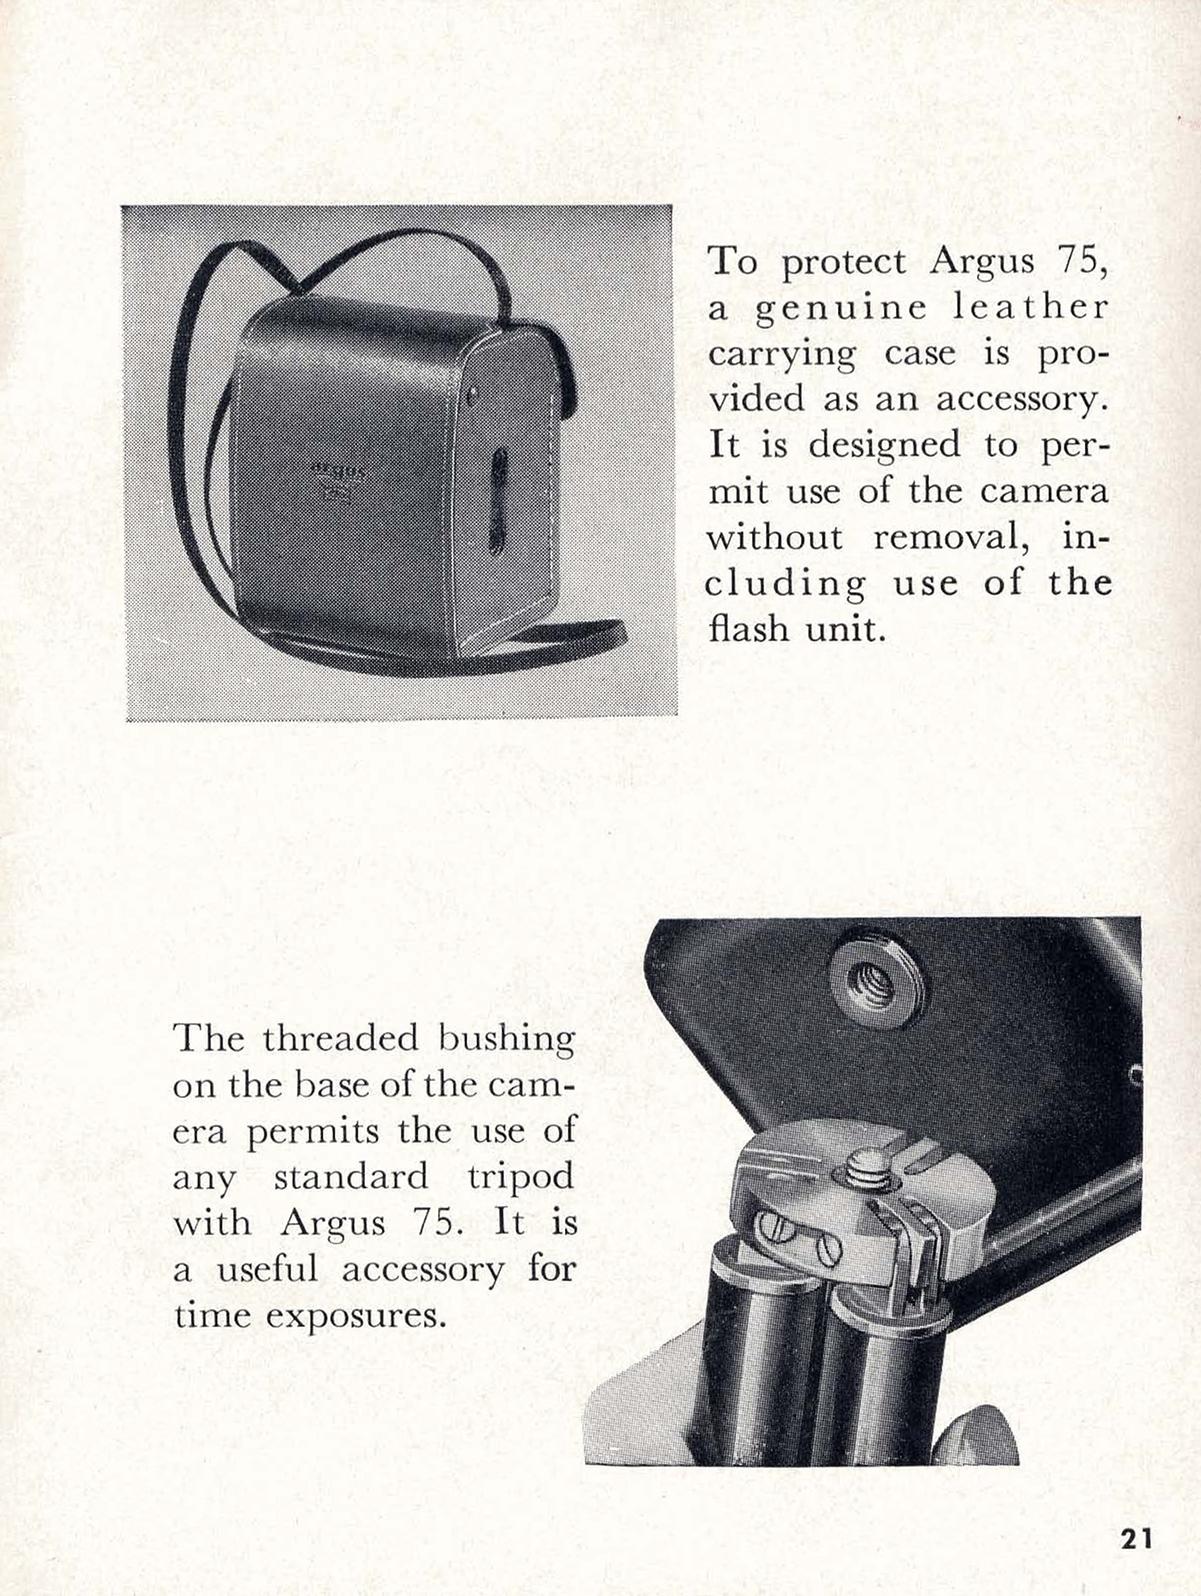 argus 75 instructions for use ann arbor district library rh aadl org Vintage Argus Camera Vintage Argus Camera